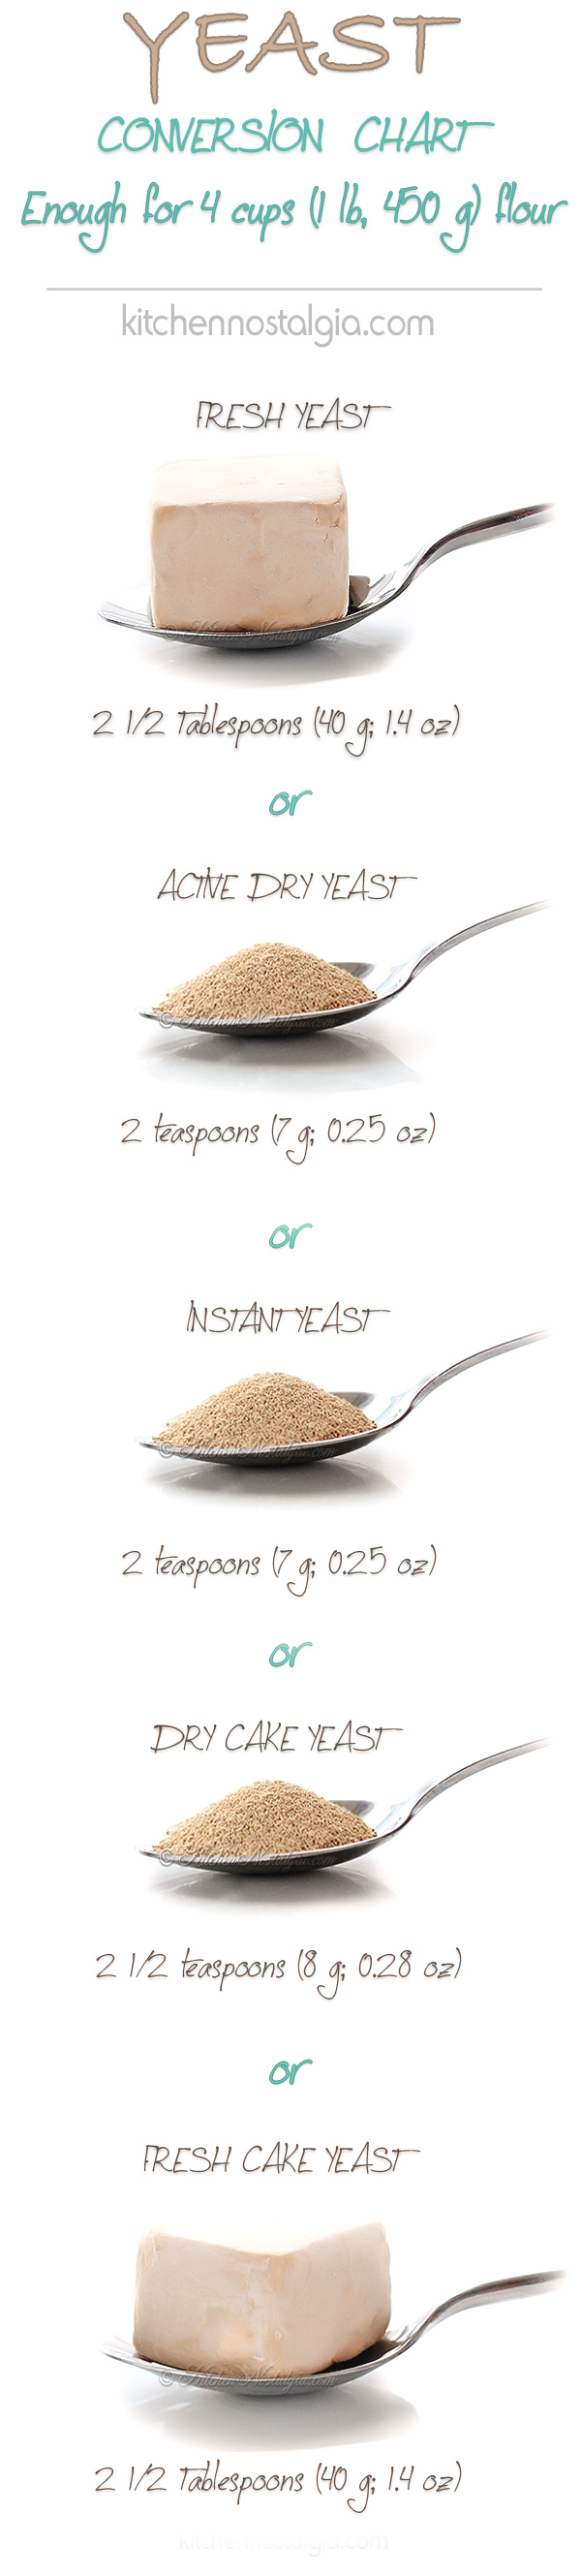 Yeast Conversion Chart - by kitchennostalgia.com